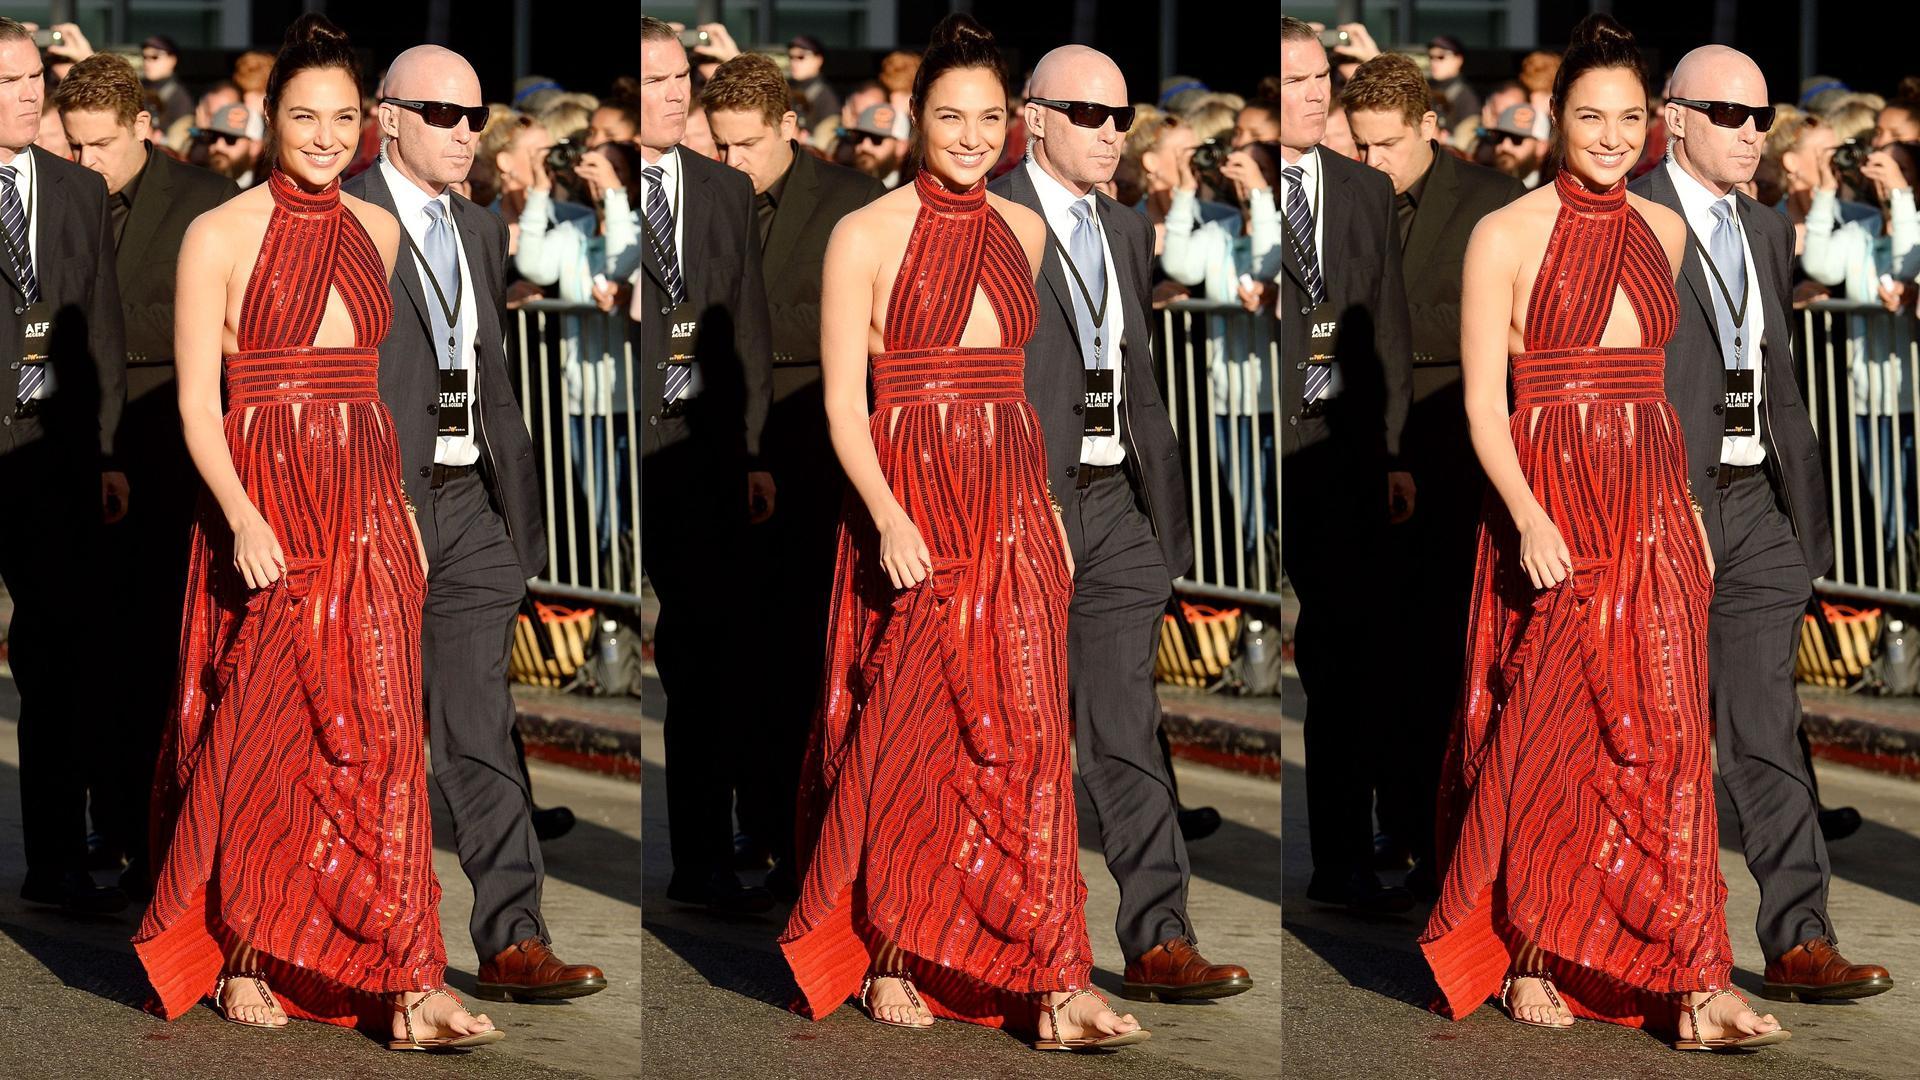 Gal Gadot Wears Aldo To Her Wonder Woman Premiere